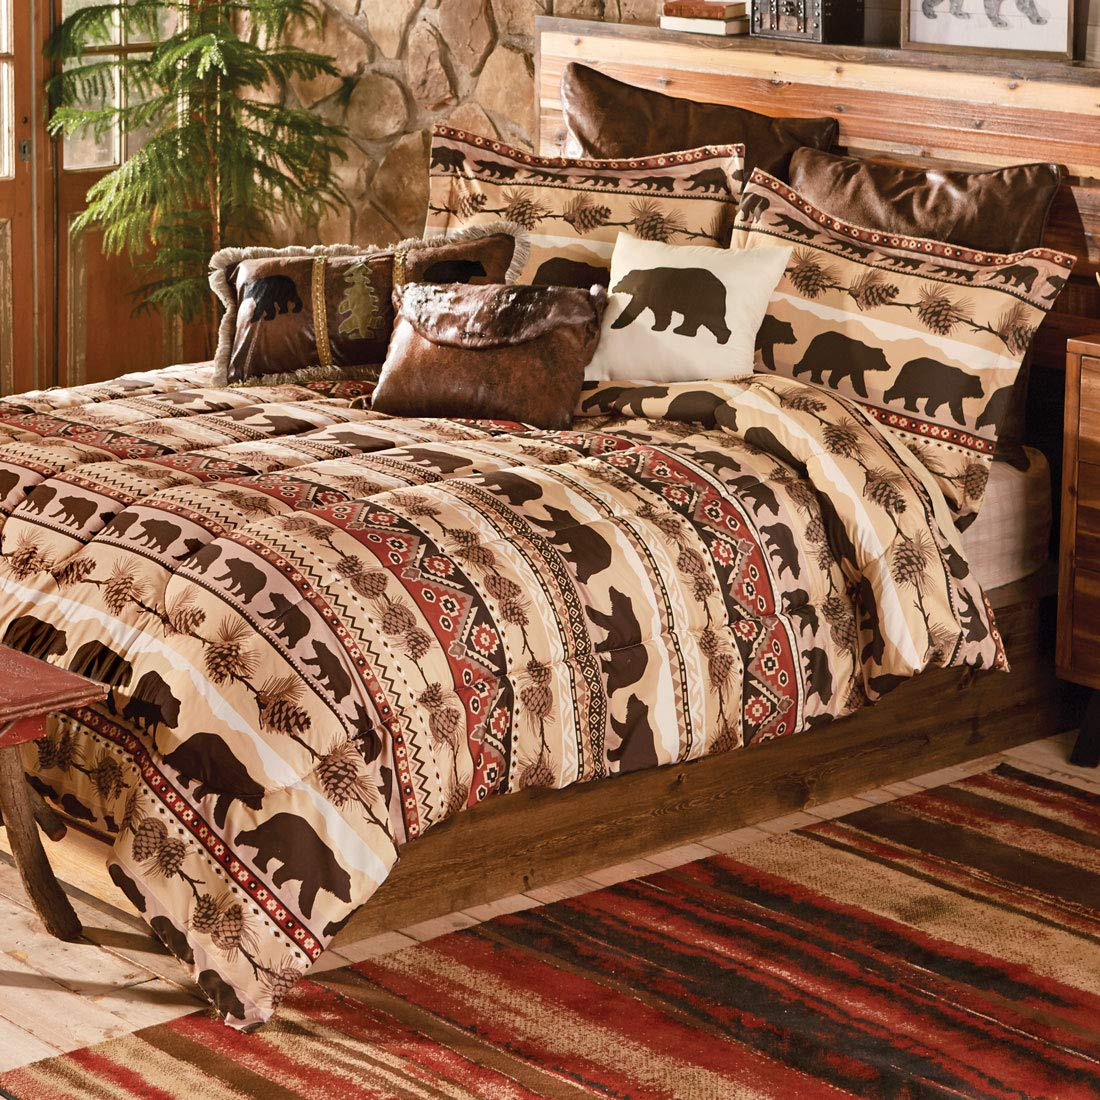 Black Forest Décor Mountainside Bear Bed Set - King